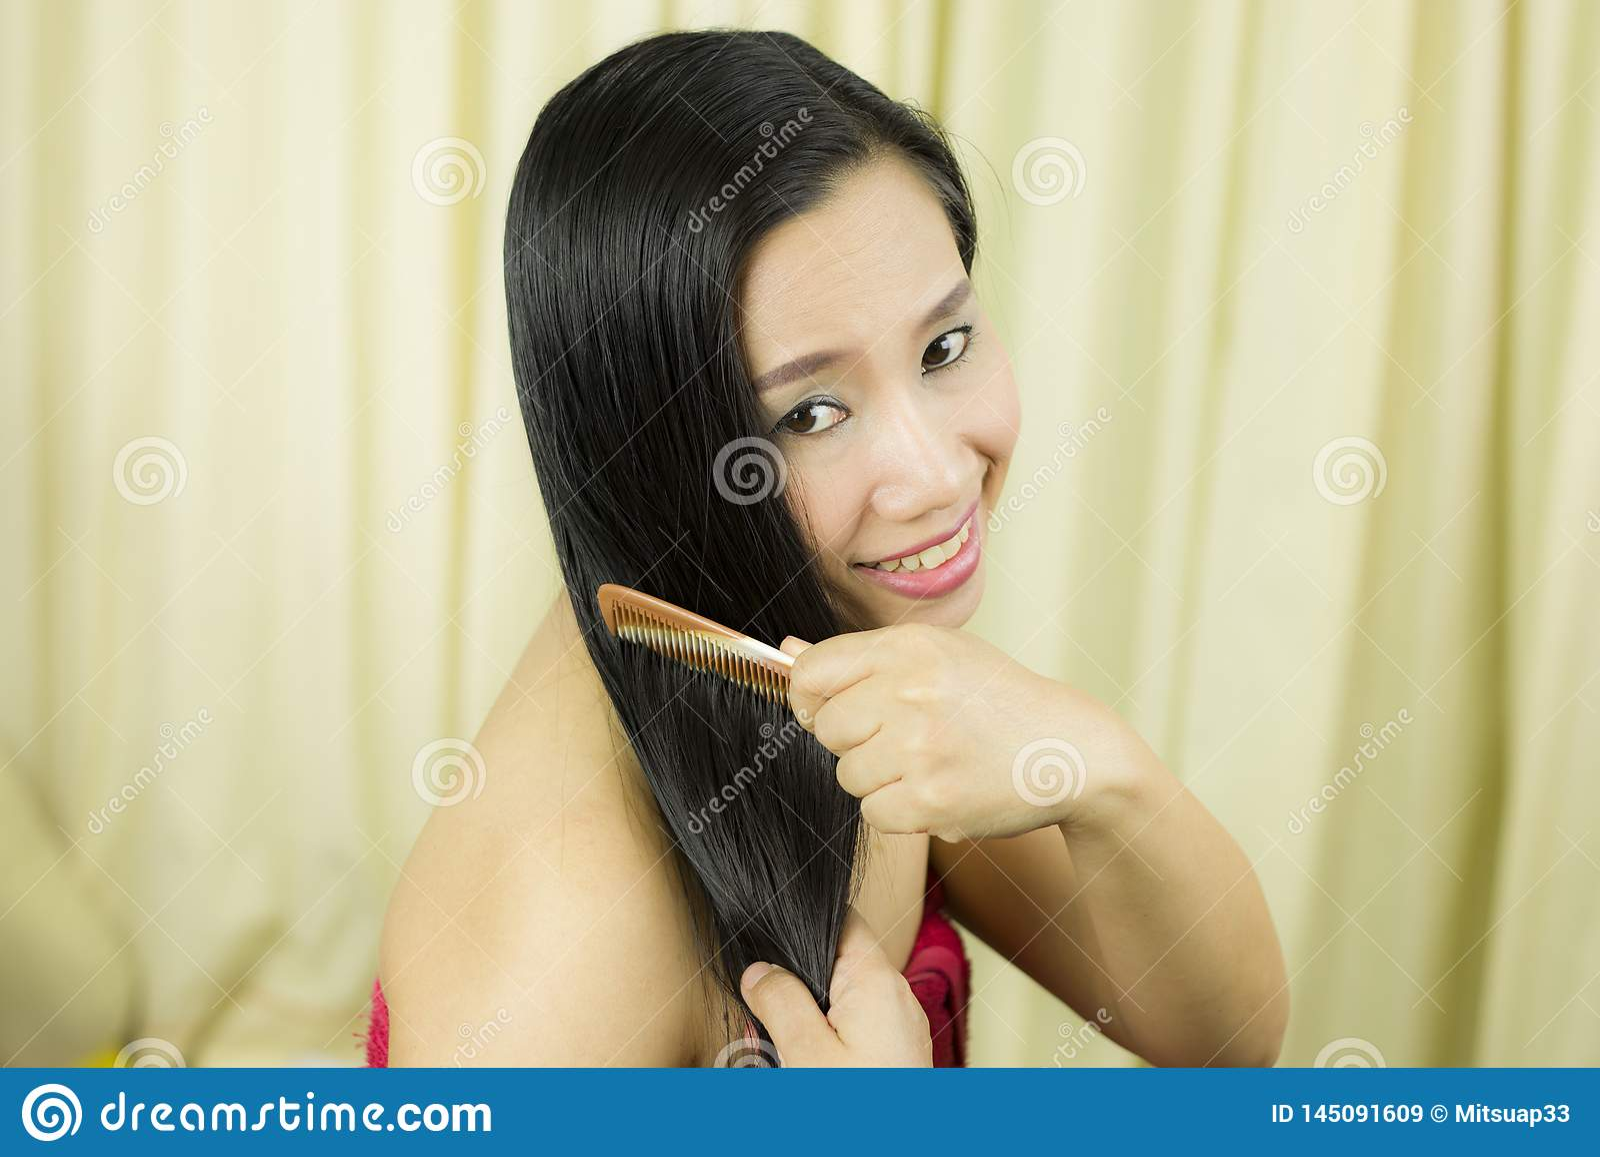 R Κινηματογράφηση σε πρώτο πλάνο της όμορφης τρίχας Hairbrushing γυναικών με τη βούρτσα Πορτρέτο της προκλητικής θηλυκής γυναίκας